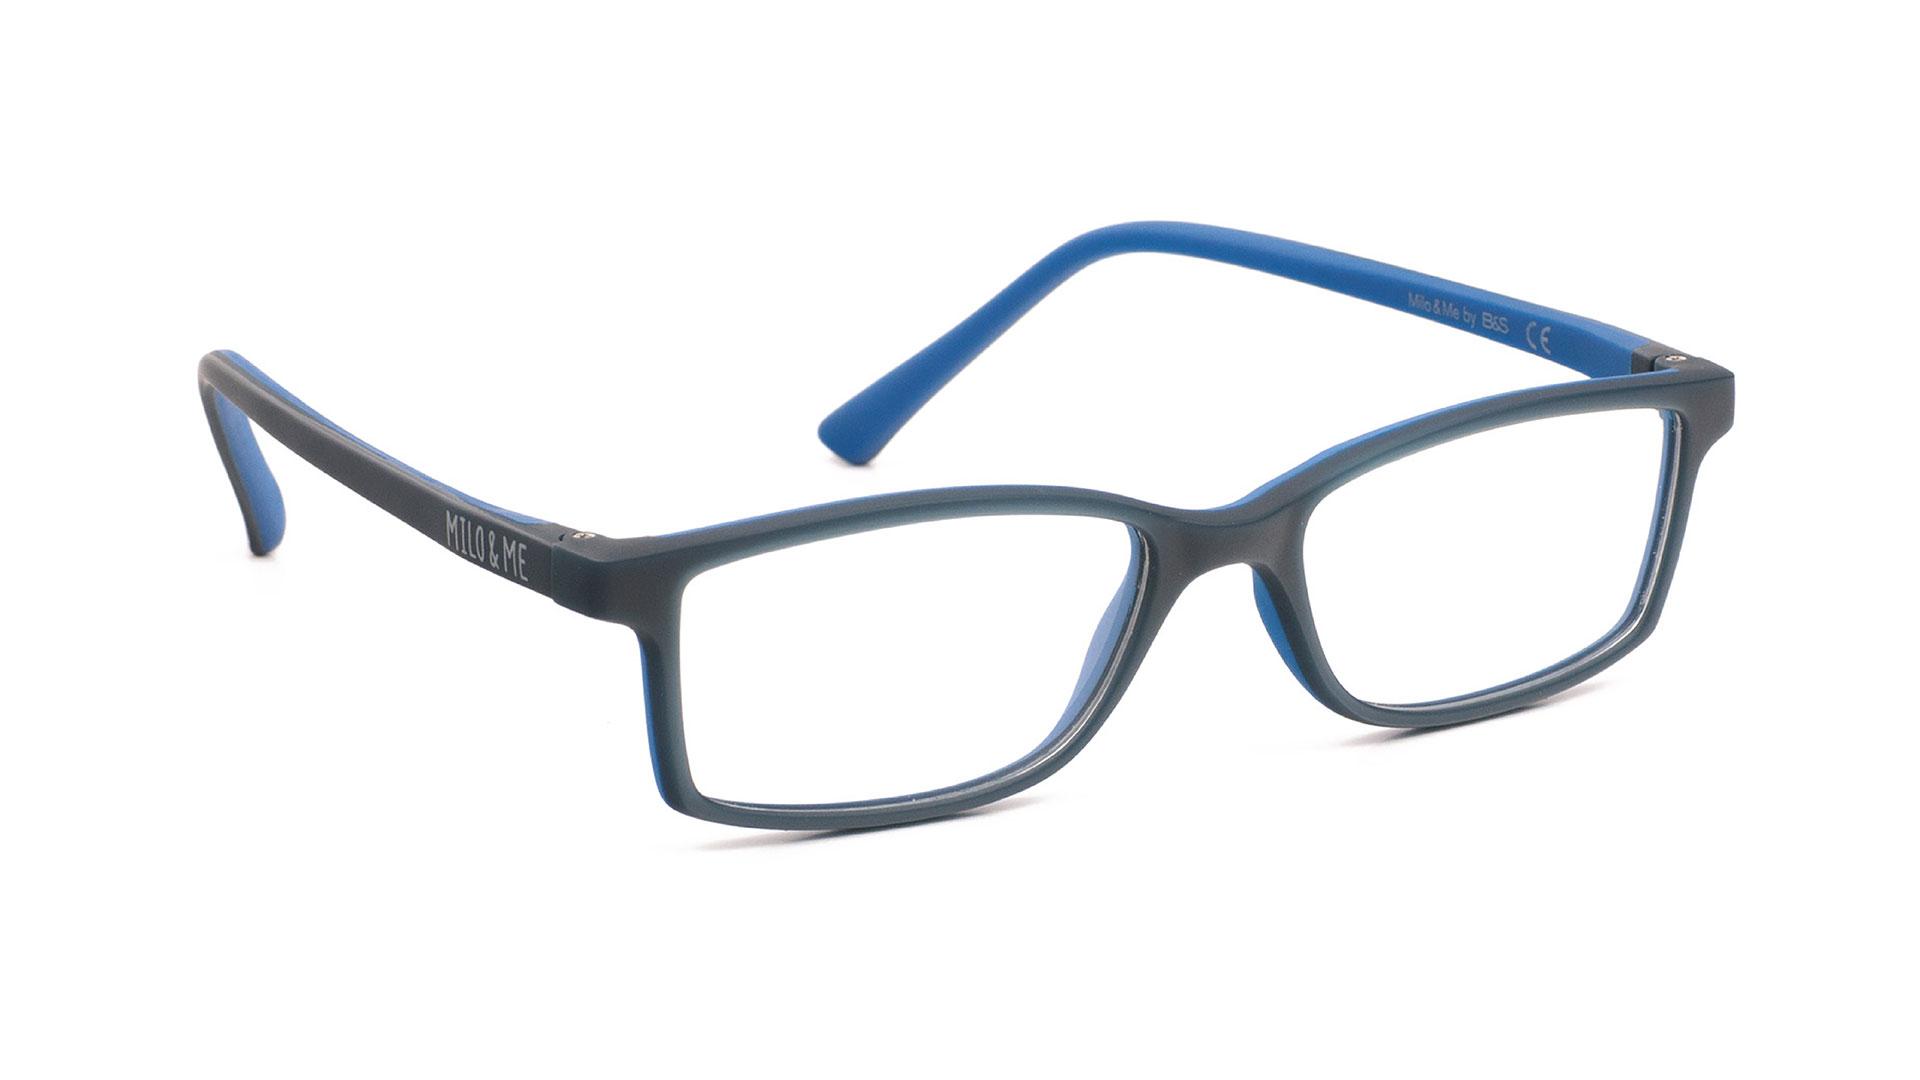 Blue GreyBlue H85011-01 - Milo & Me Eyewear - Optimum RX Lens Specialists